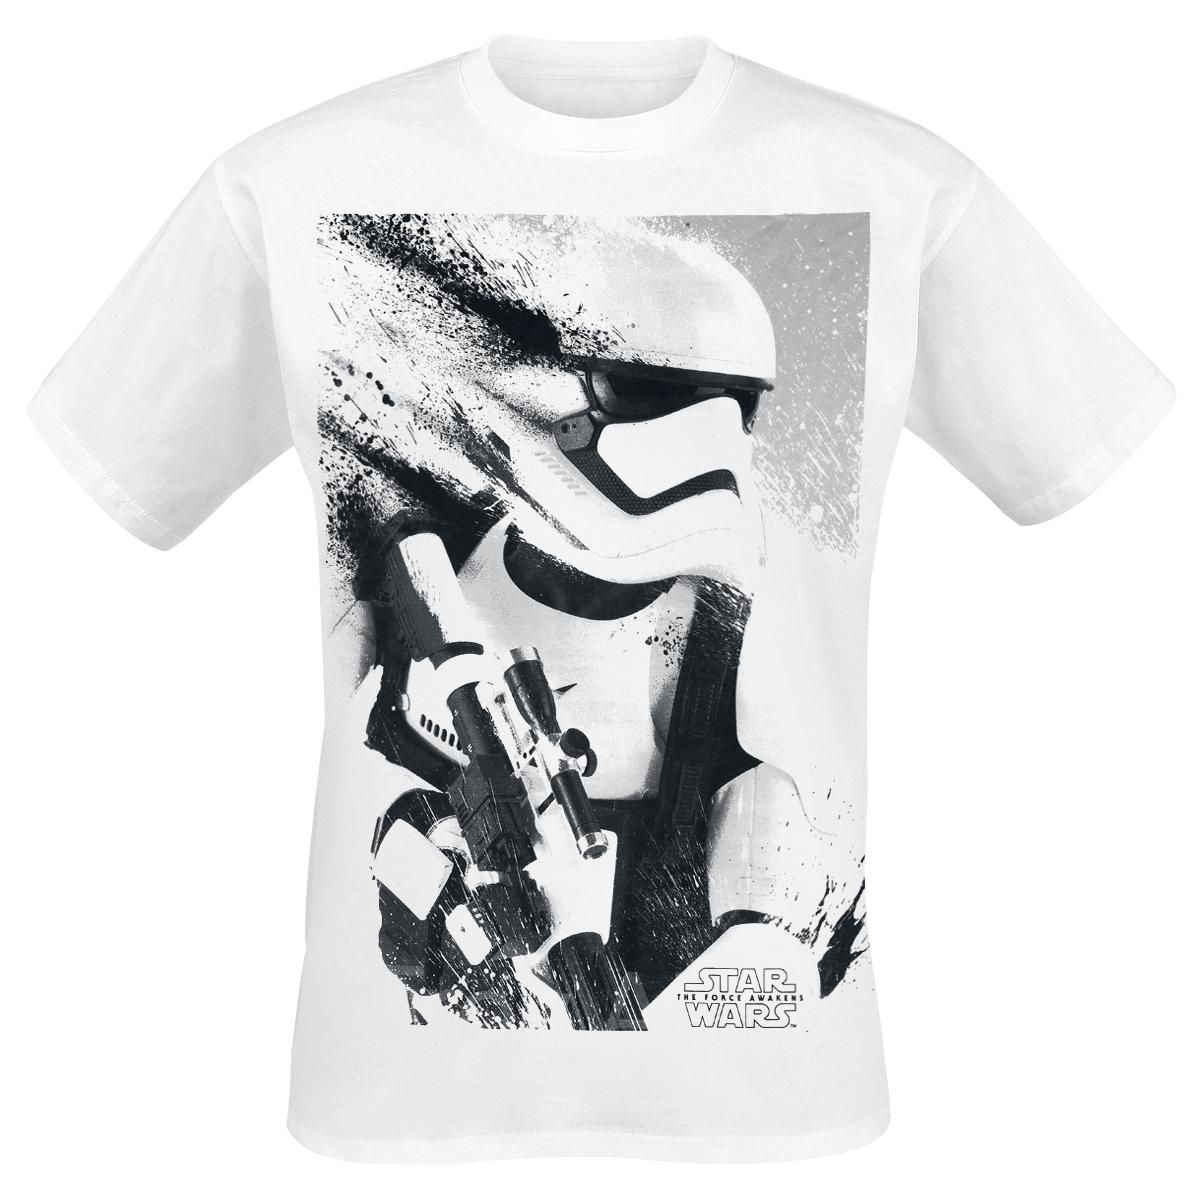 Star Wars - Episode 7 - Stormtrooper - Front großflächig bedruckt -  Rundhalsausschnitt Kunst, Film